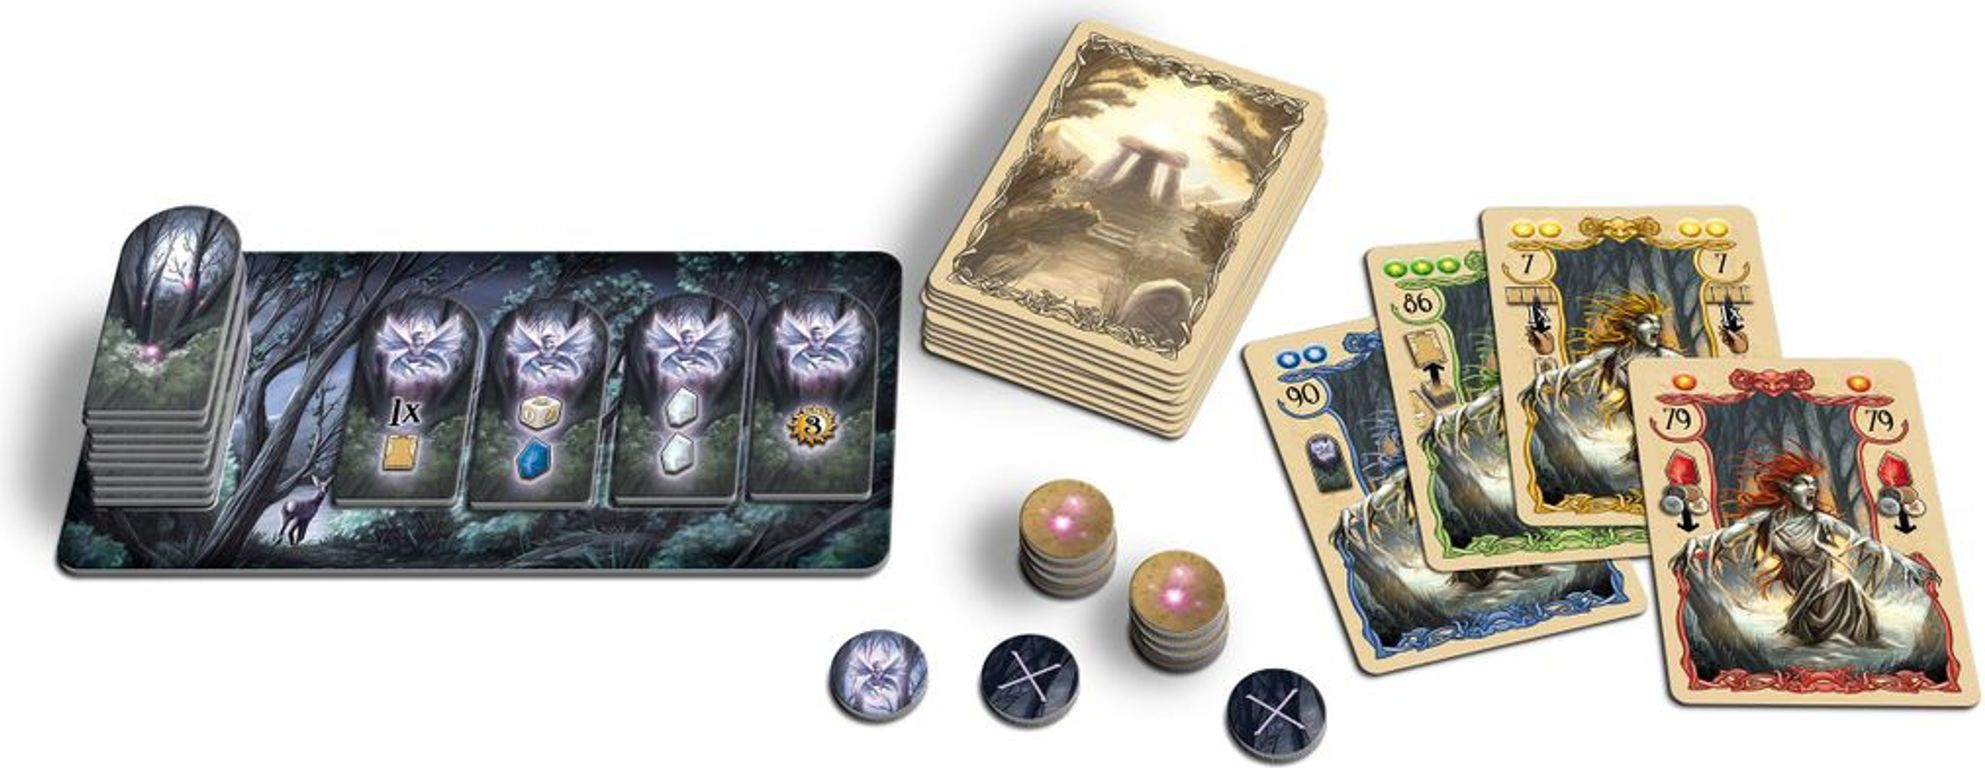 Rune Stones: Nocturnal Creatures components